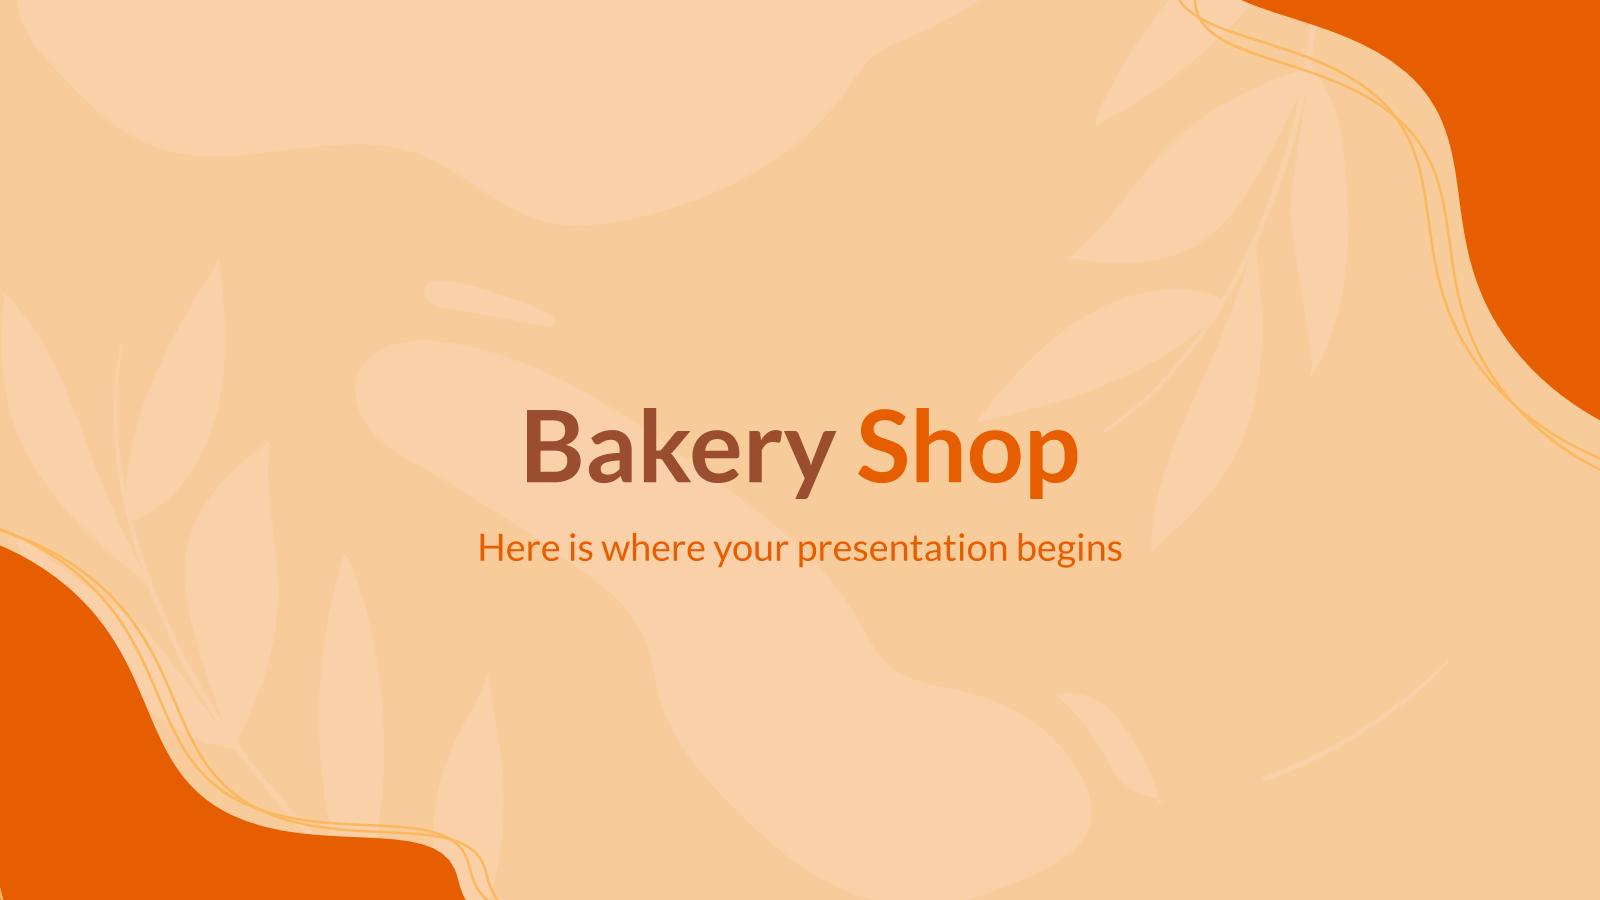 Bakery Shop presentation template